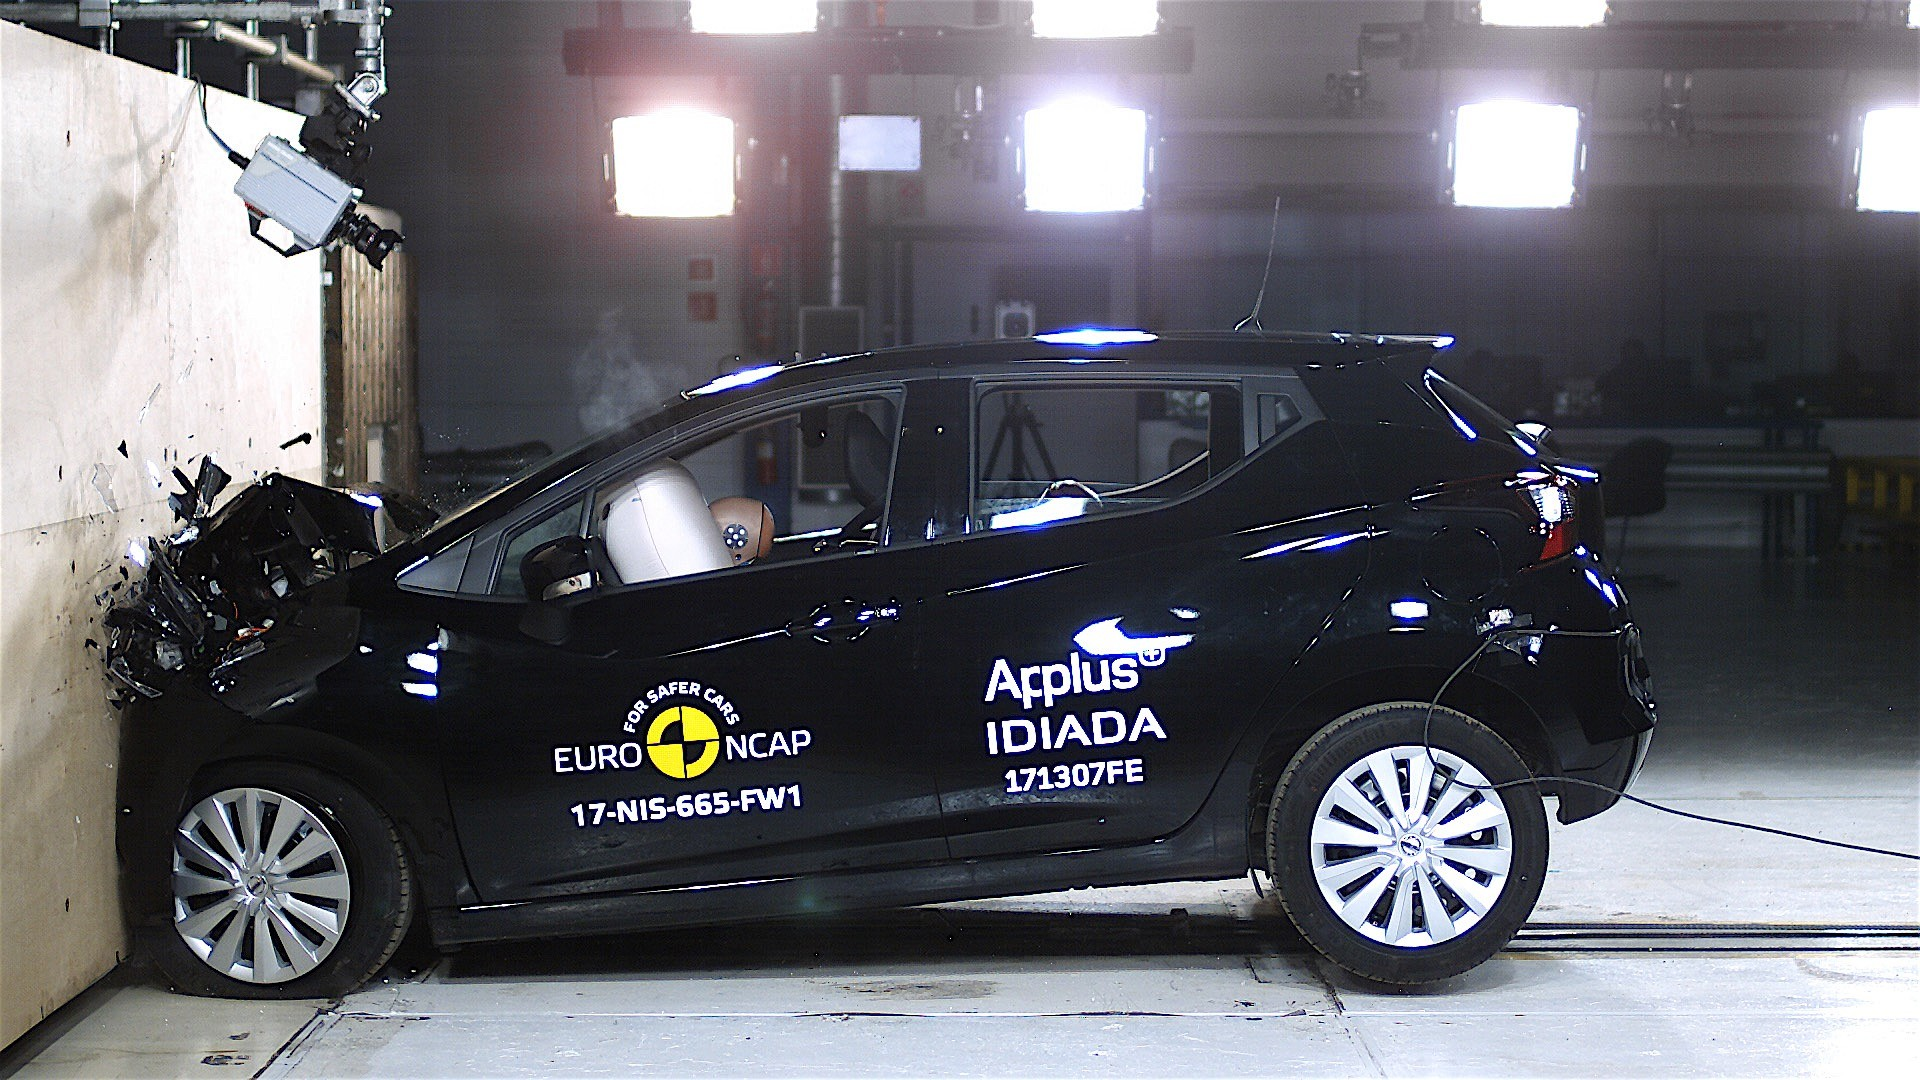 Euro NCAP crash tests may 2017 (8)